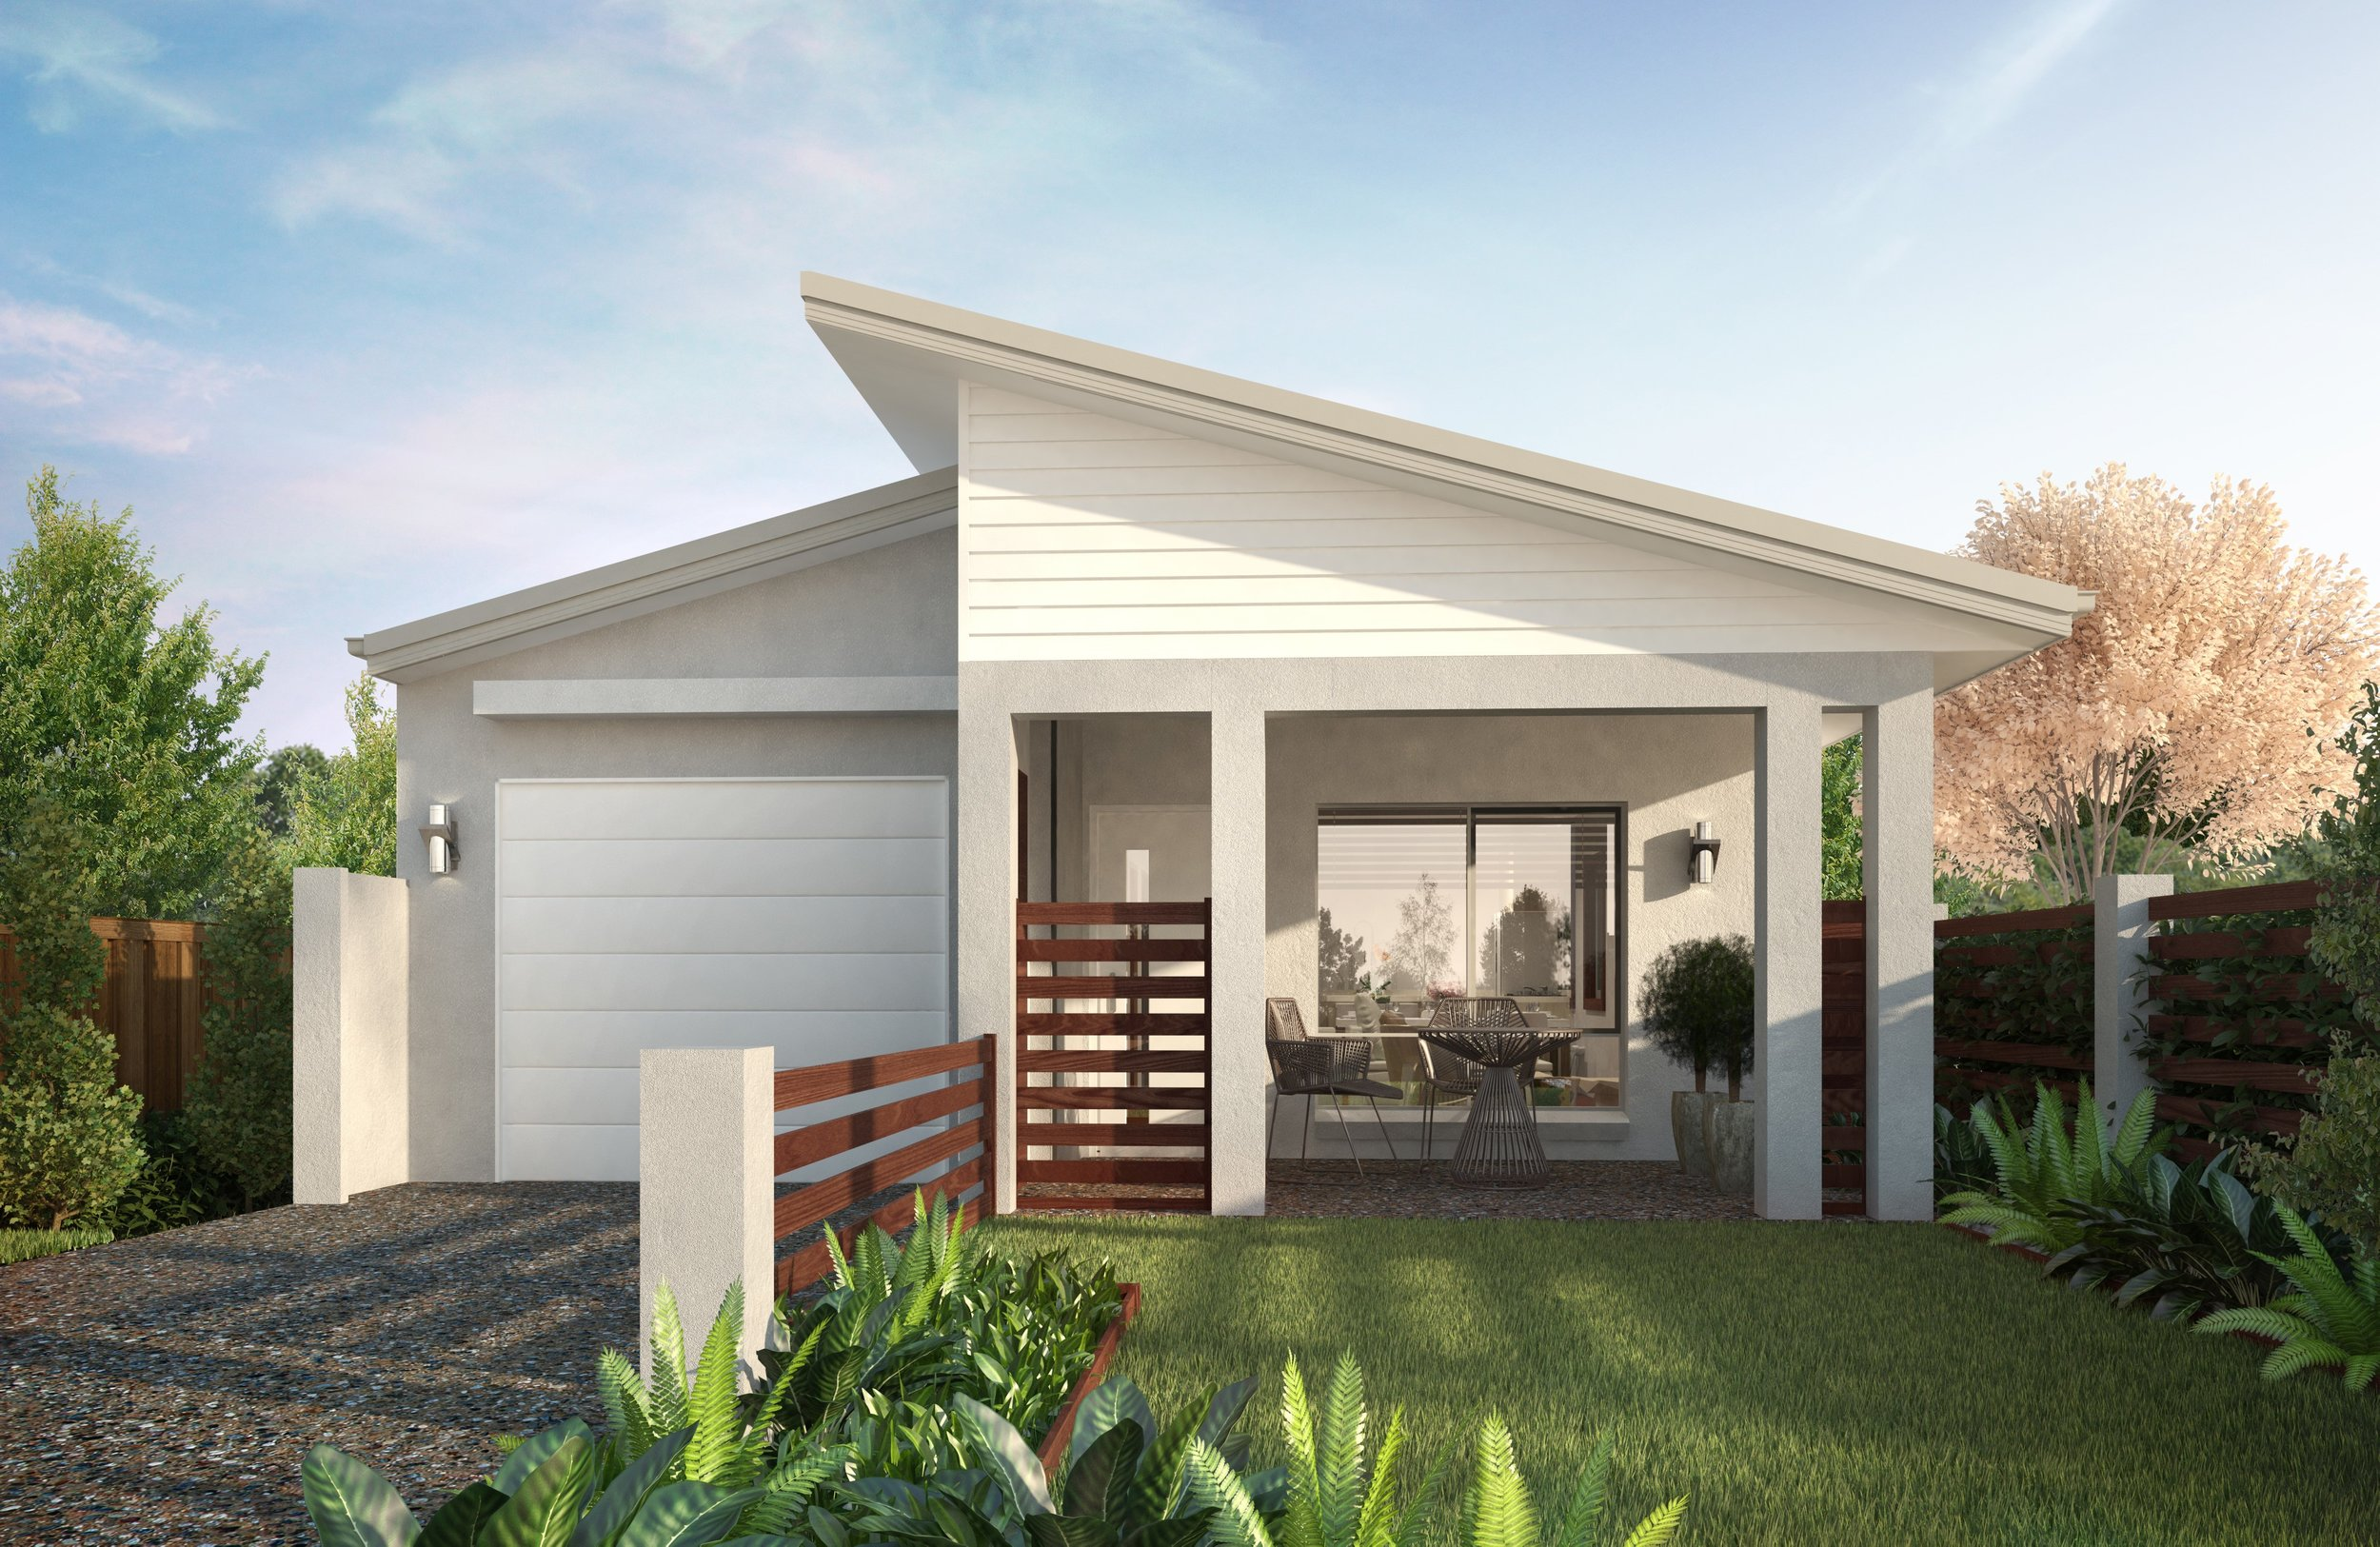 Lot 544        H & L $381,400 - 4 BED 2 BATH 1 CAR- 2700mm high ceilings- Skillion roof design- 'Smart Villa' Inclusions